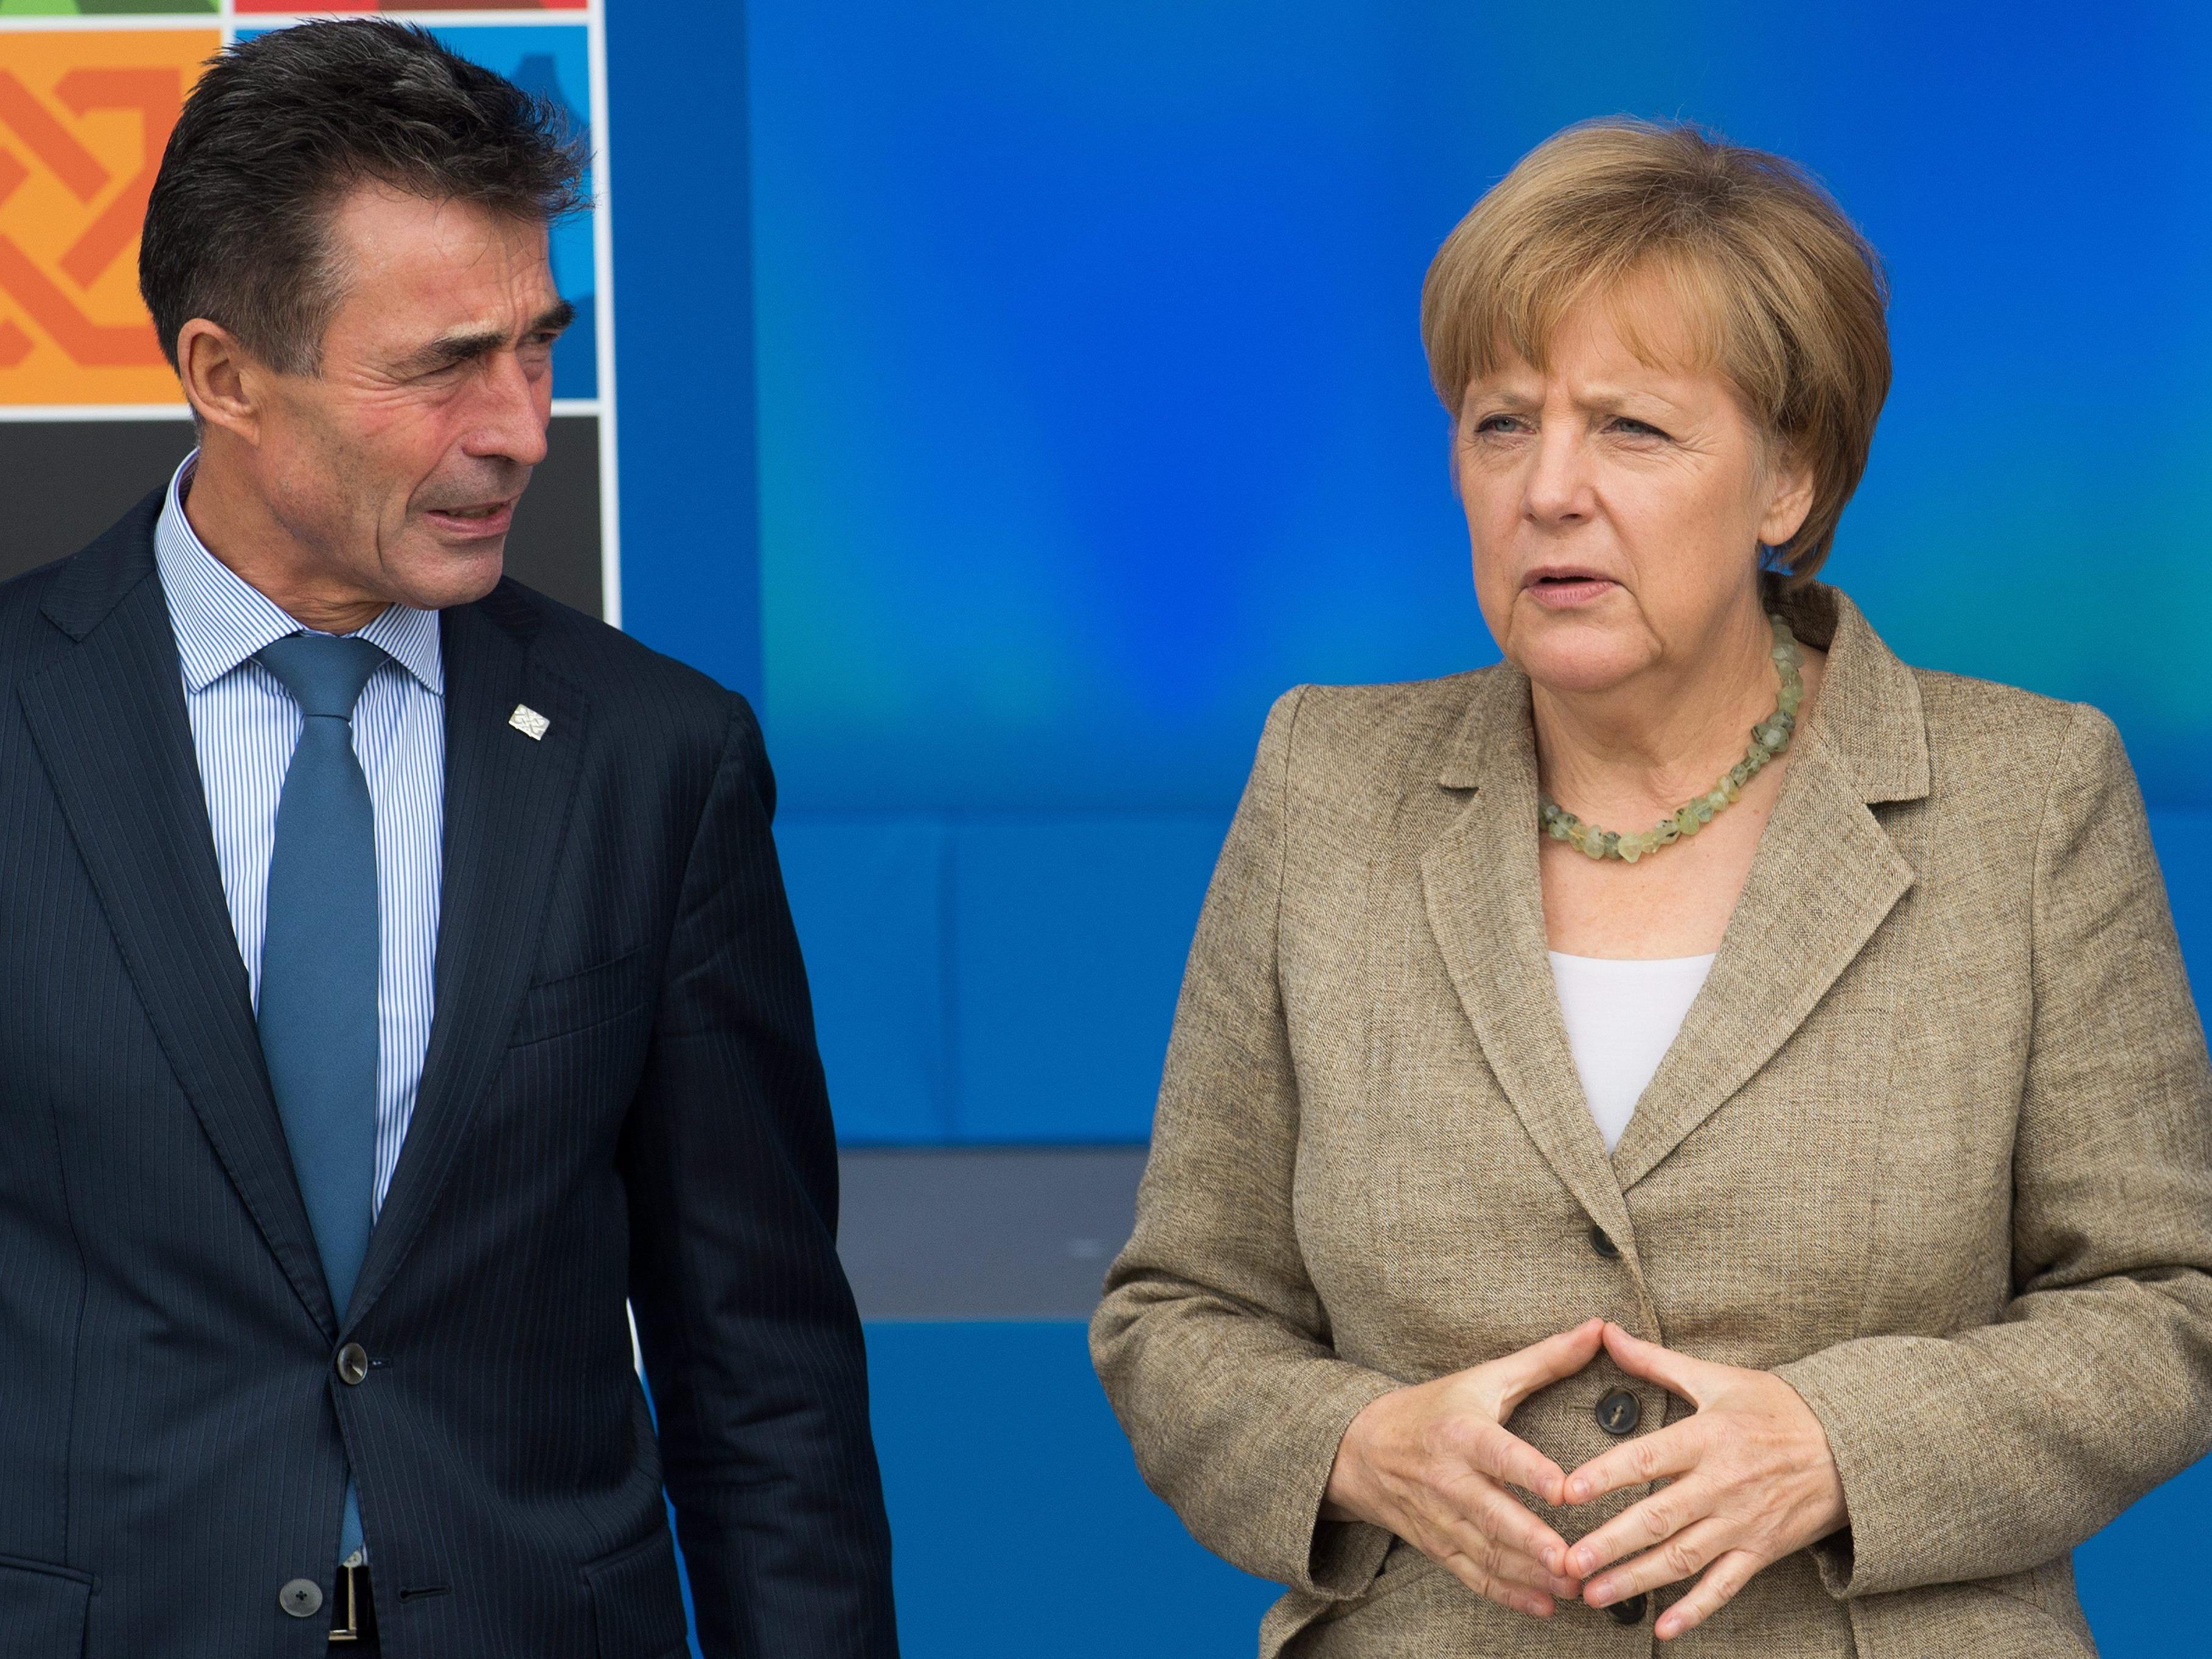 Ex-Geheimdienstler warnen Angela Merkel, hier mit NATO-Generalsekretär Rasmussen am NATO-Gipfel in Wales.